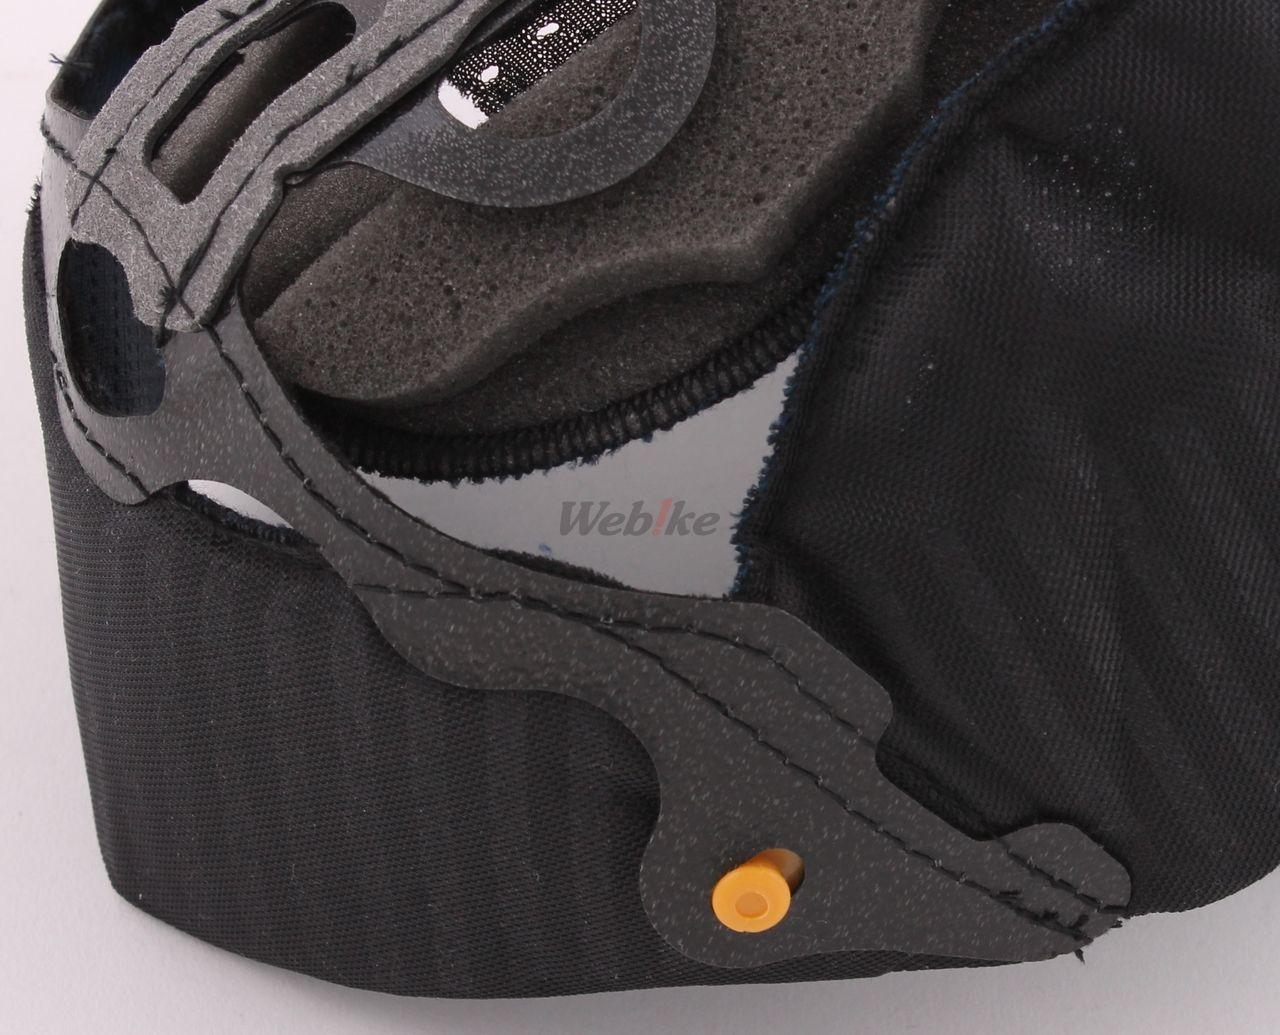 【Arai】RX-7RR4 系統內襯 - 「Webike-摩托百貨」